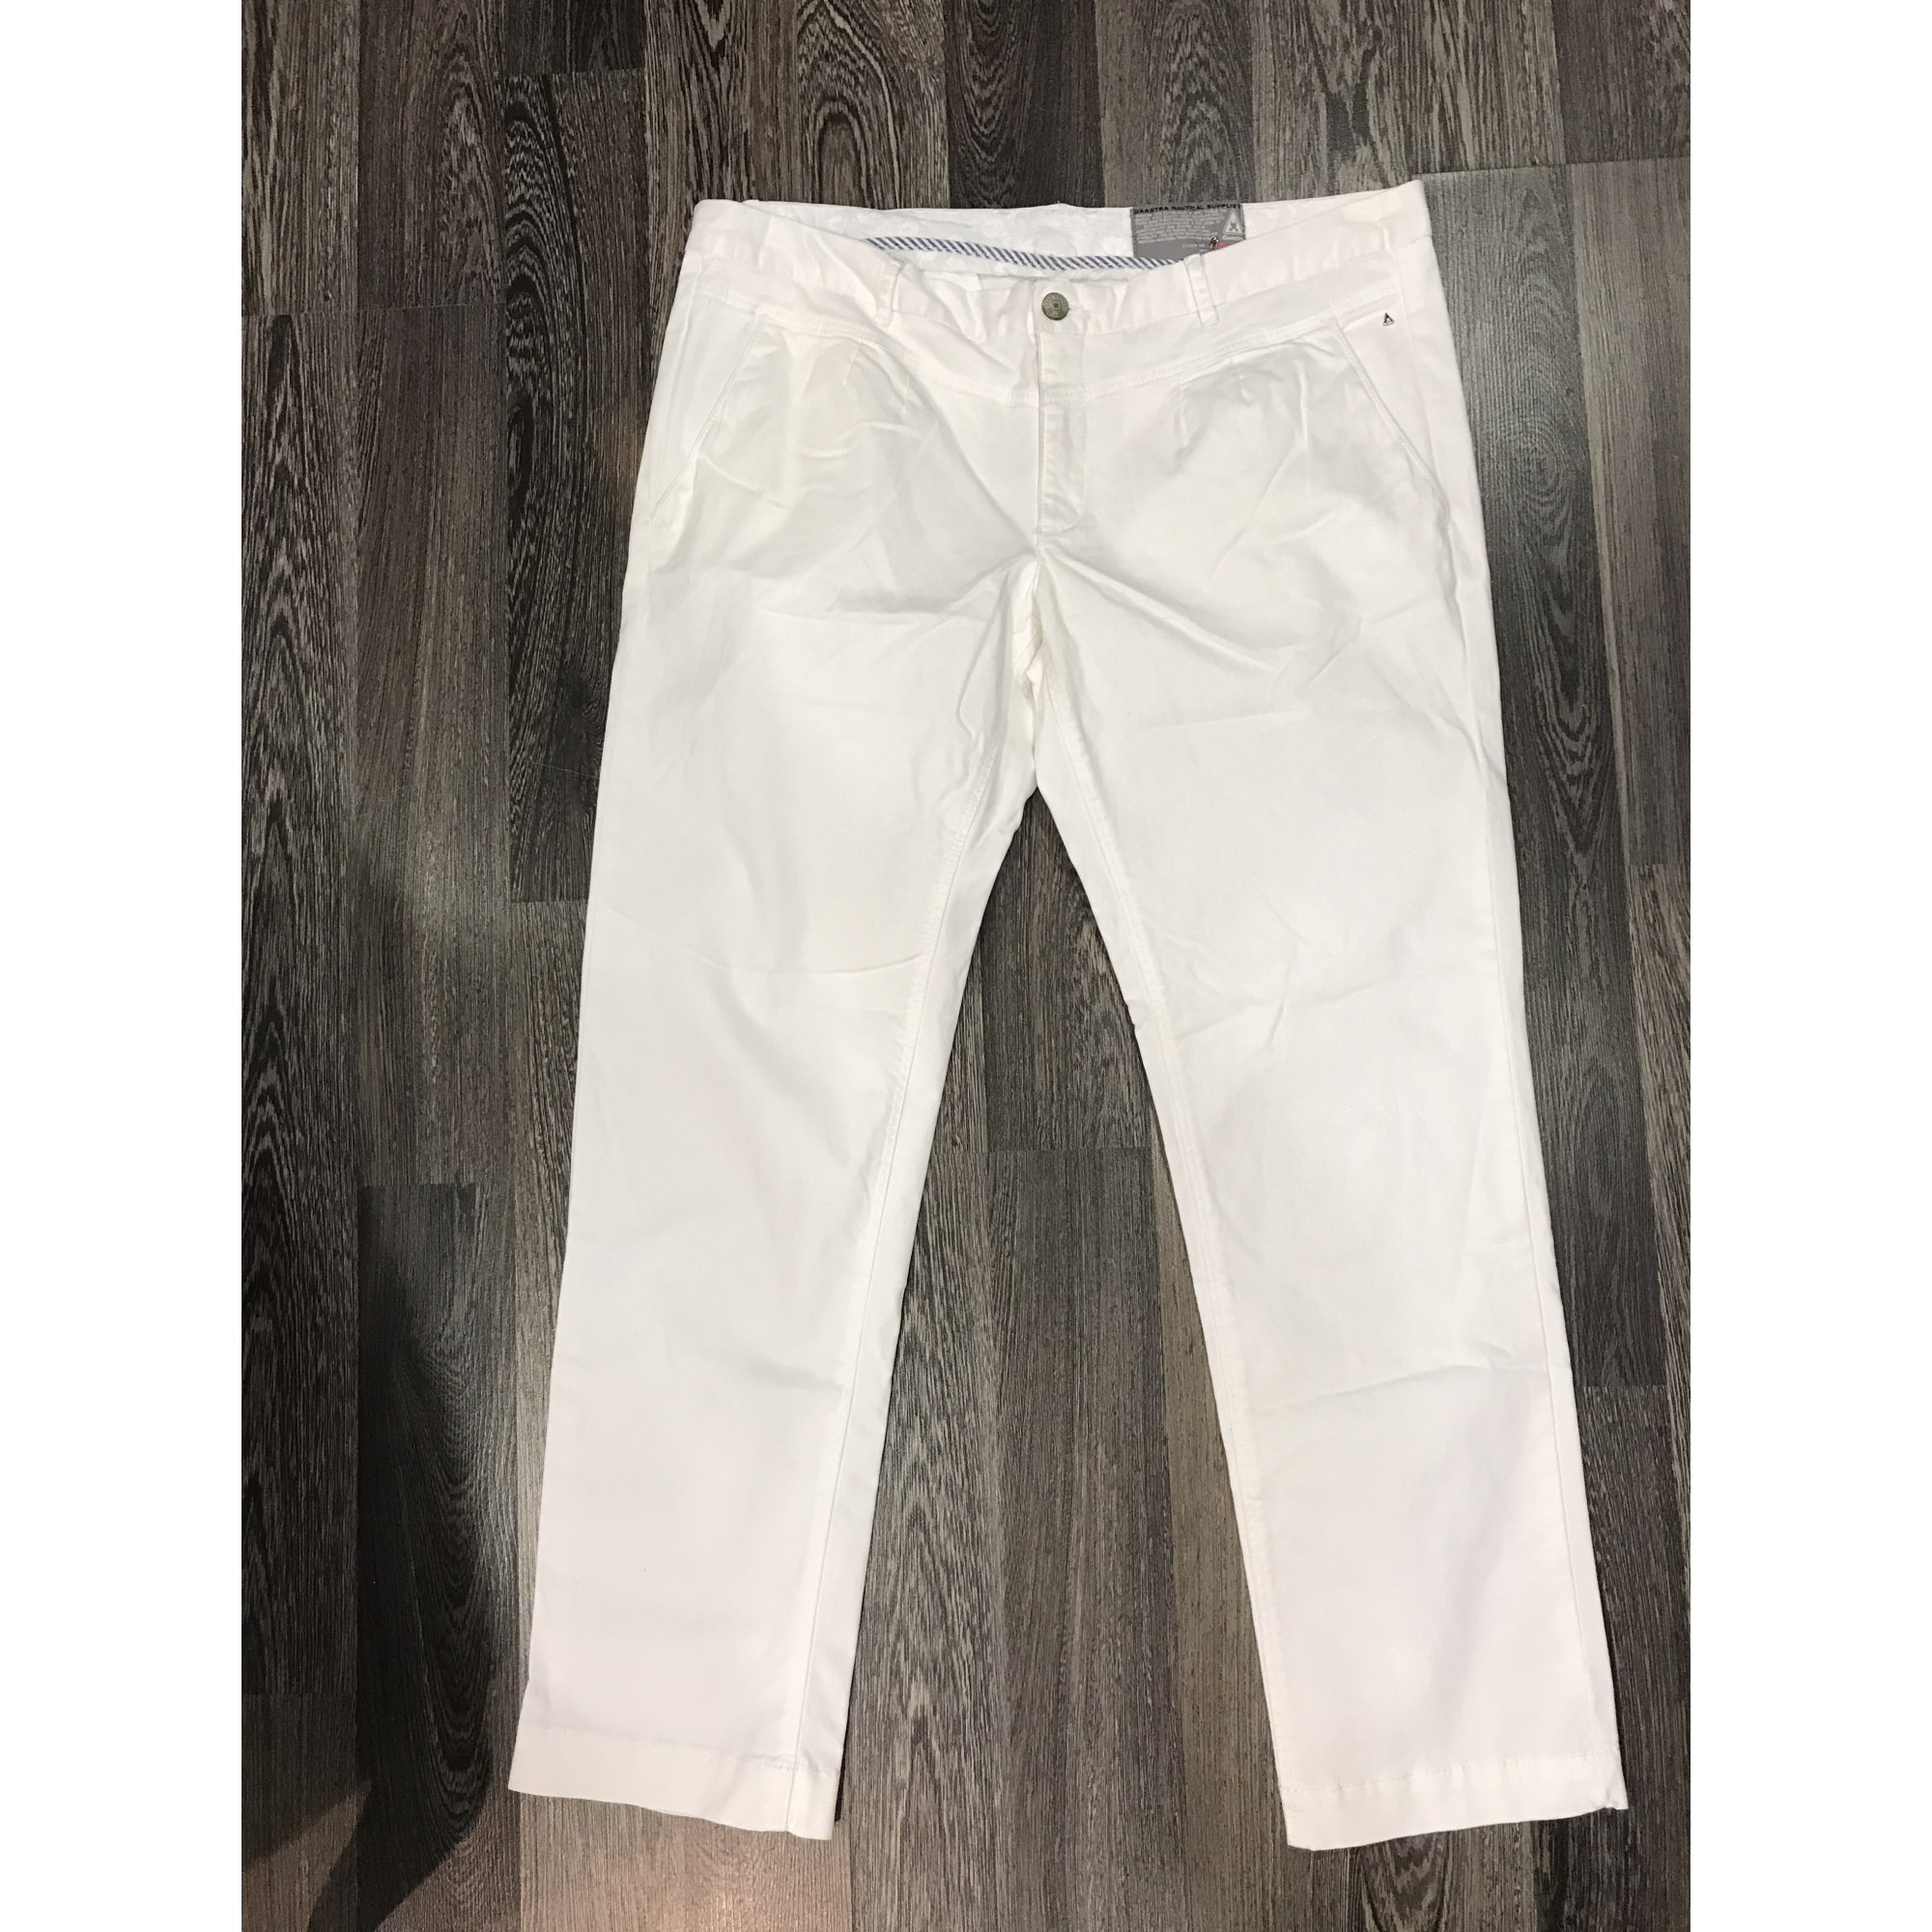 pantalon garcon slim blanc casse